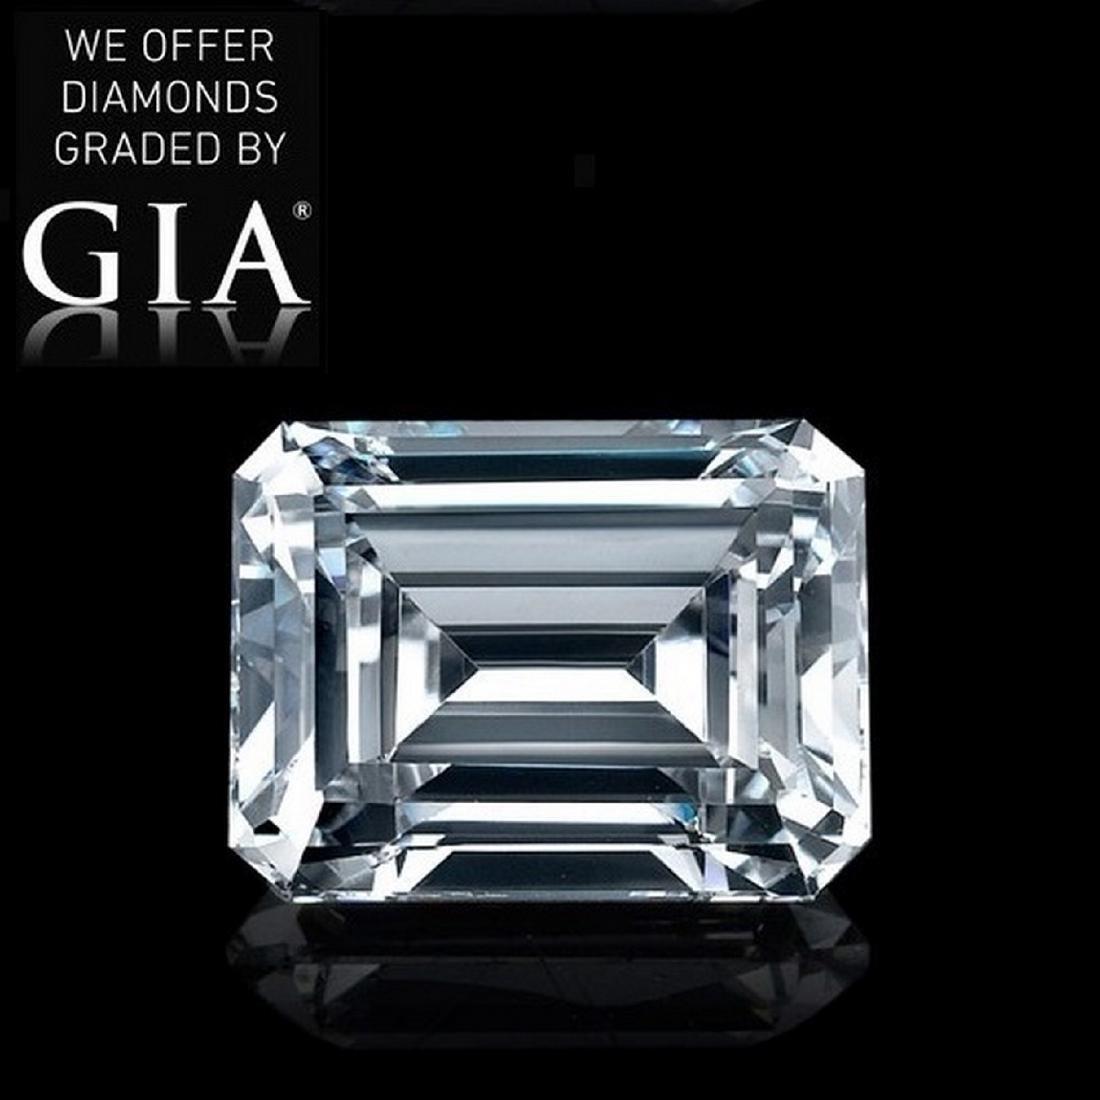 2.51 ct, Color F/VVS2, Emerald cut Diamond